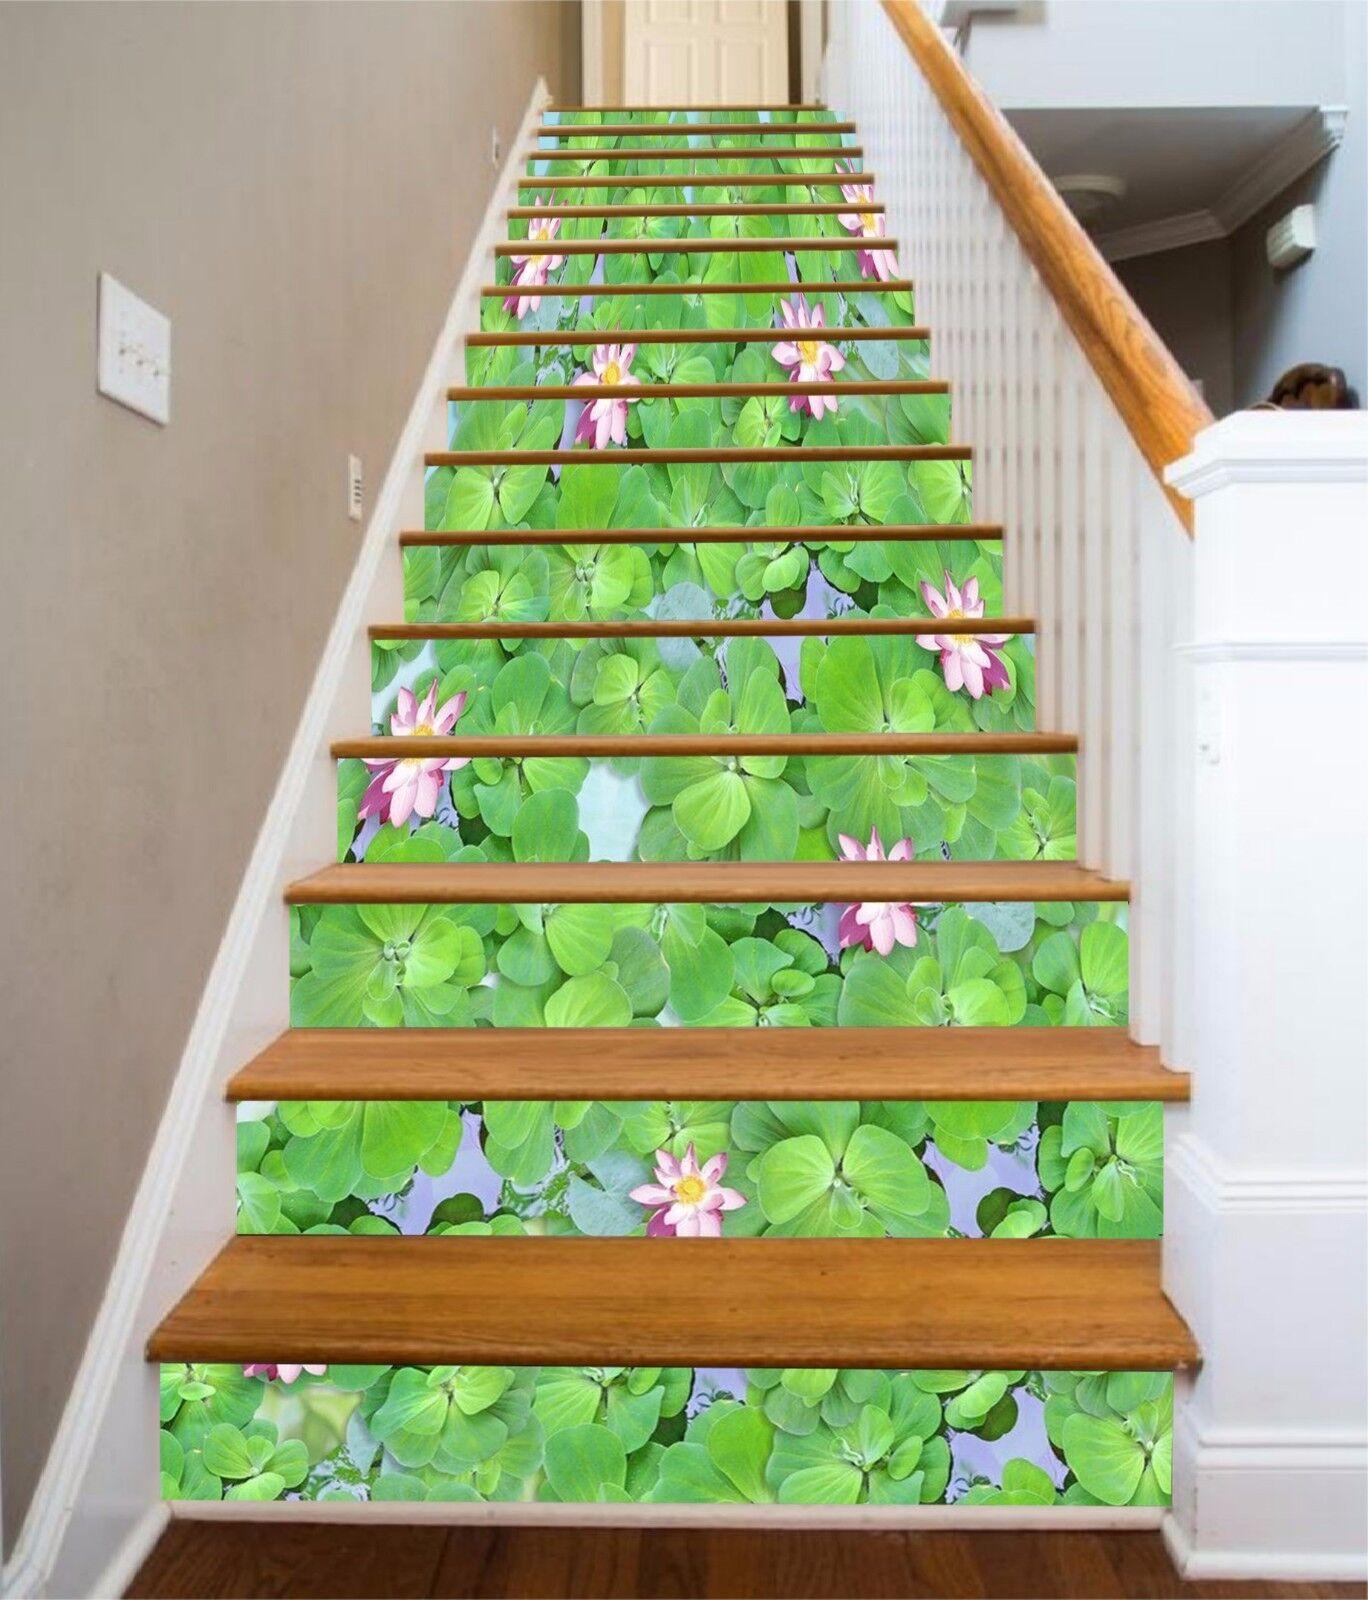 3D Lake Flowers 696 Stair Risers Decoration Photo Mural Vinyl Decal Wallpaper UK